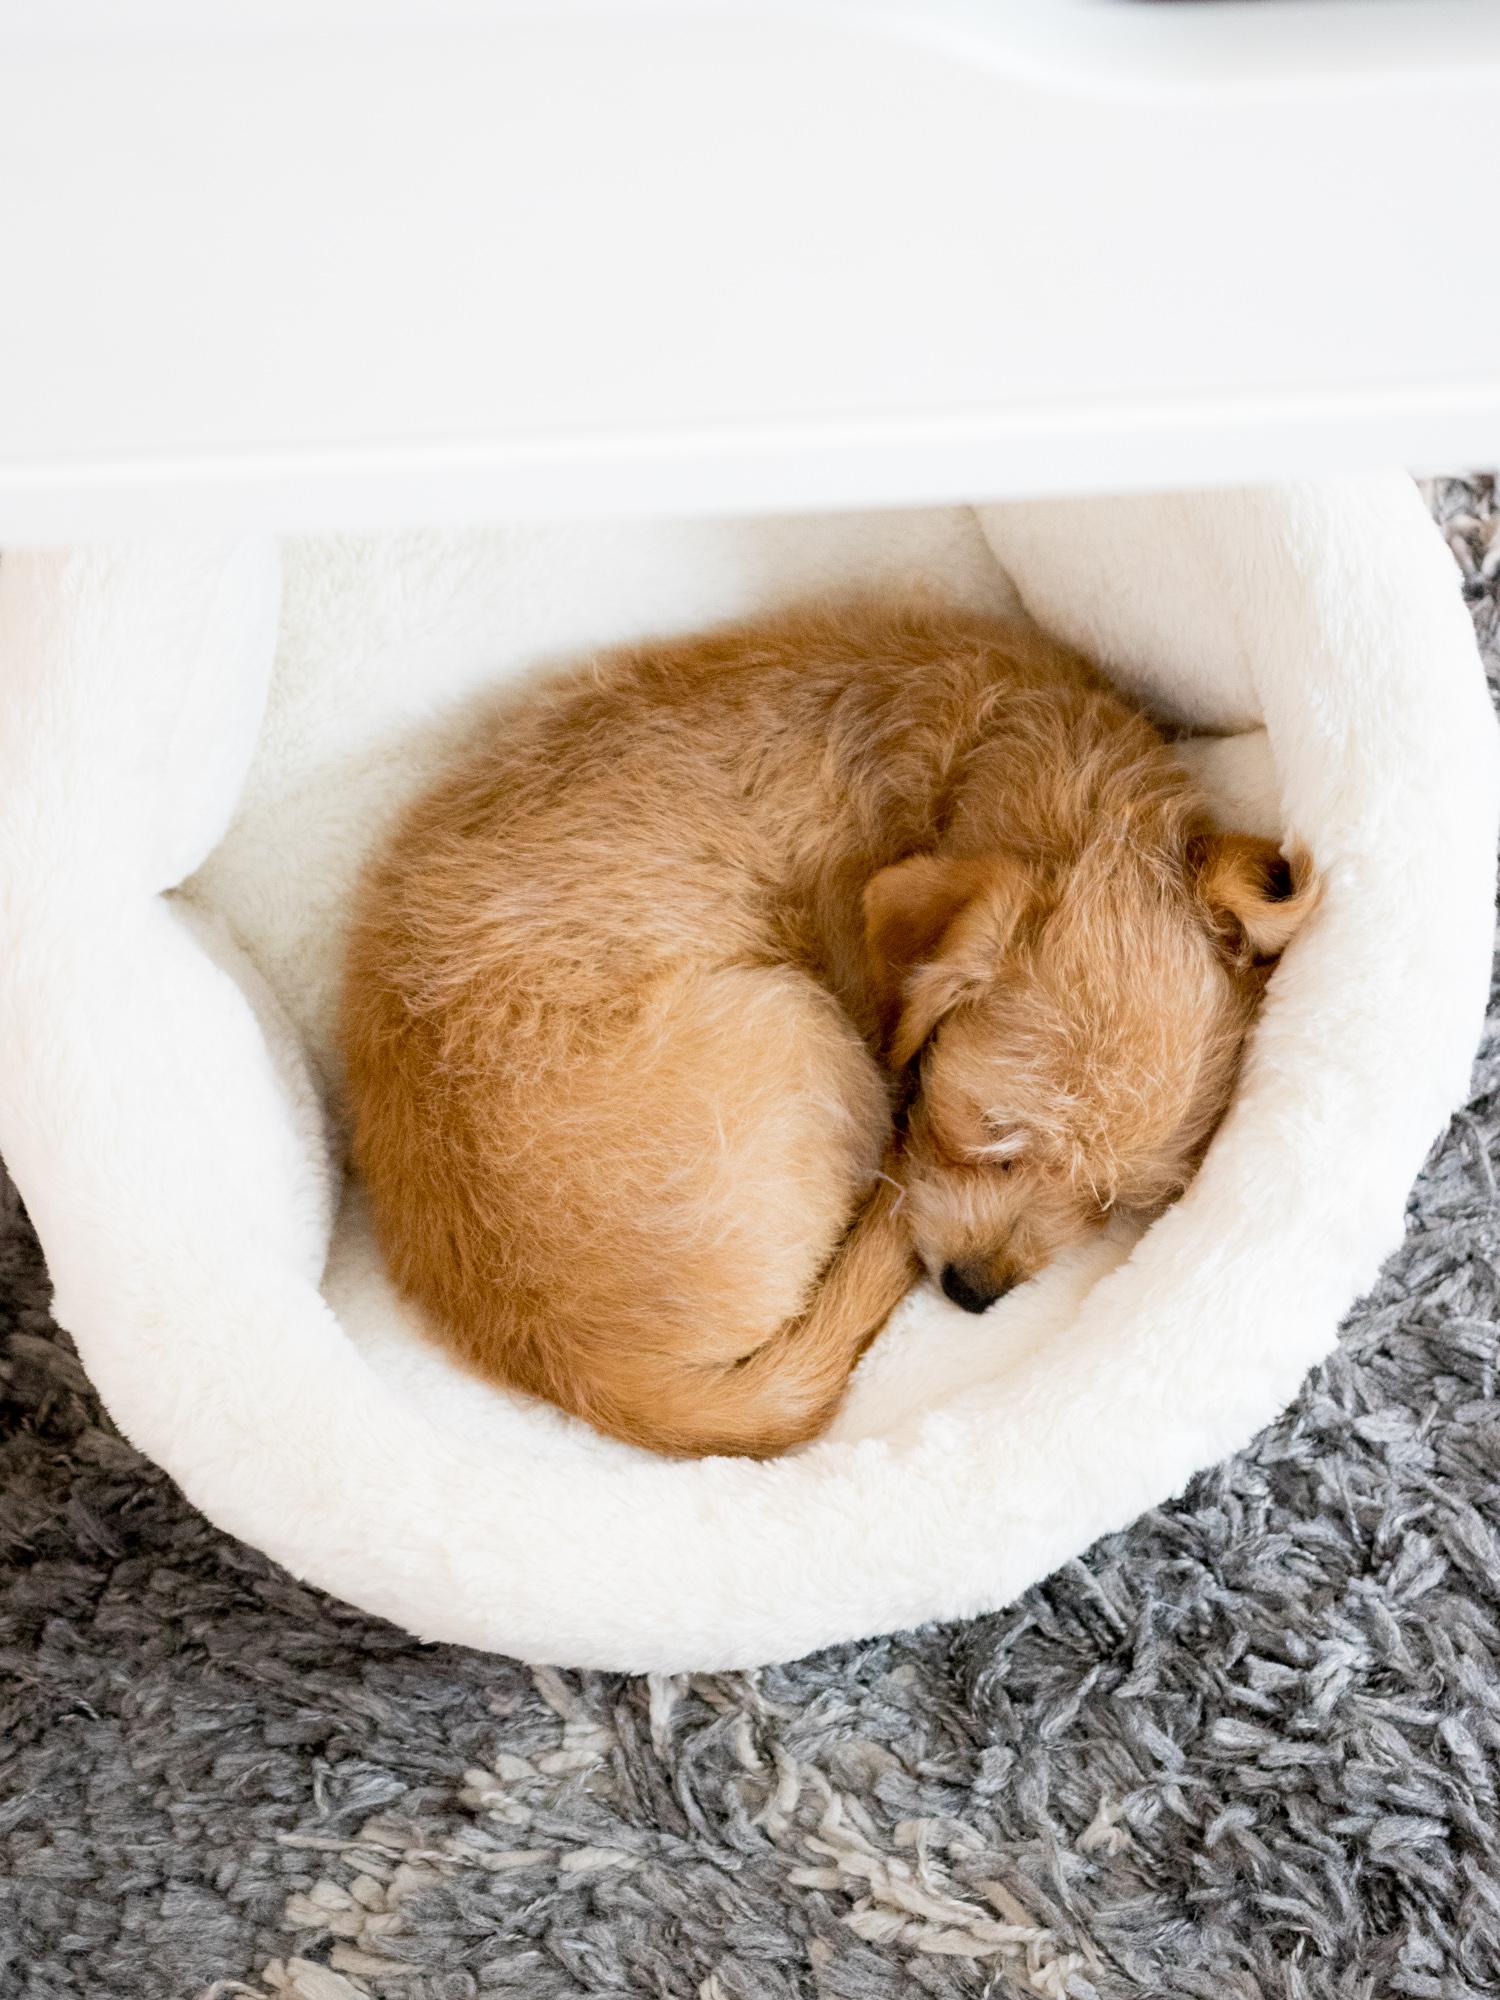 Peanut the Puppy Sleeping under the Desk